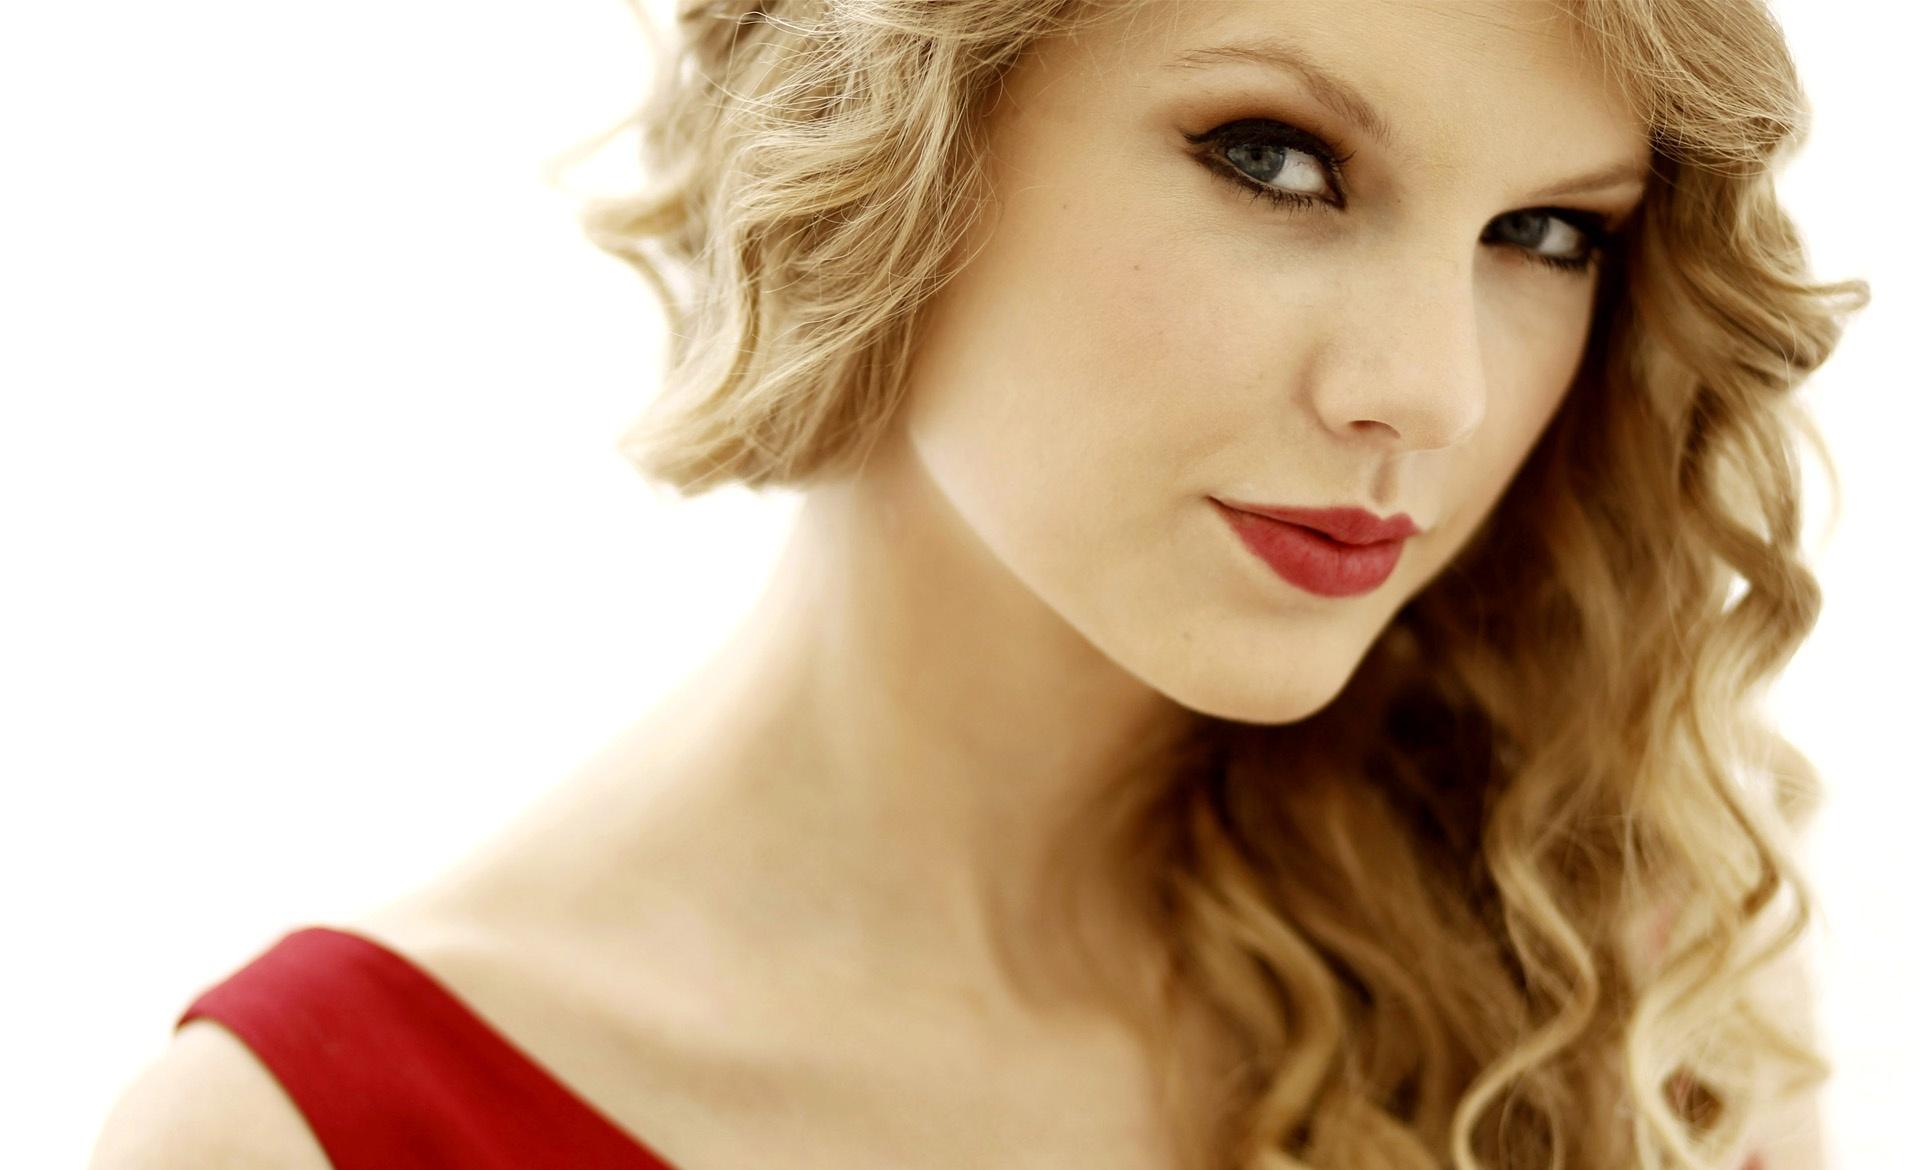 Taylor Swift Zoom Image